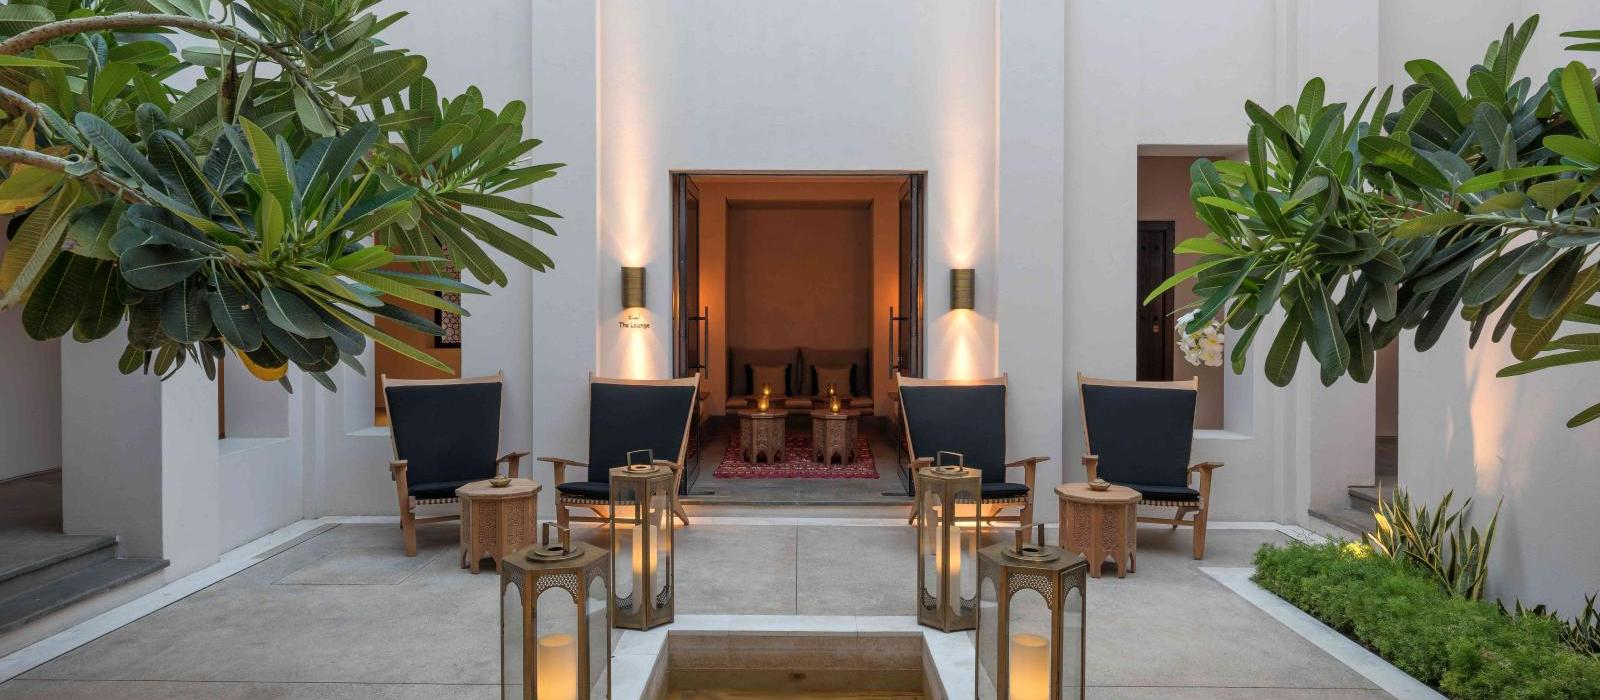 沙迦艺博澈笛度假酒店(The Chedi Al Bait, Sharjah, UAE) 图片  www.lhw.cn